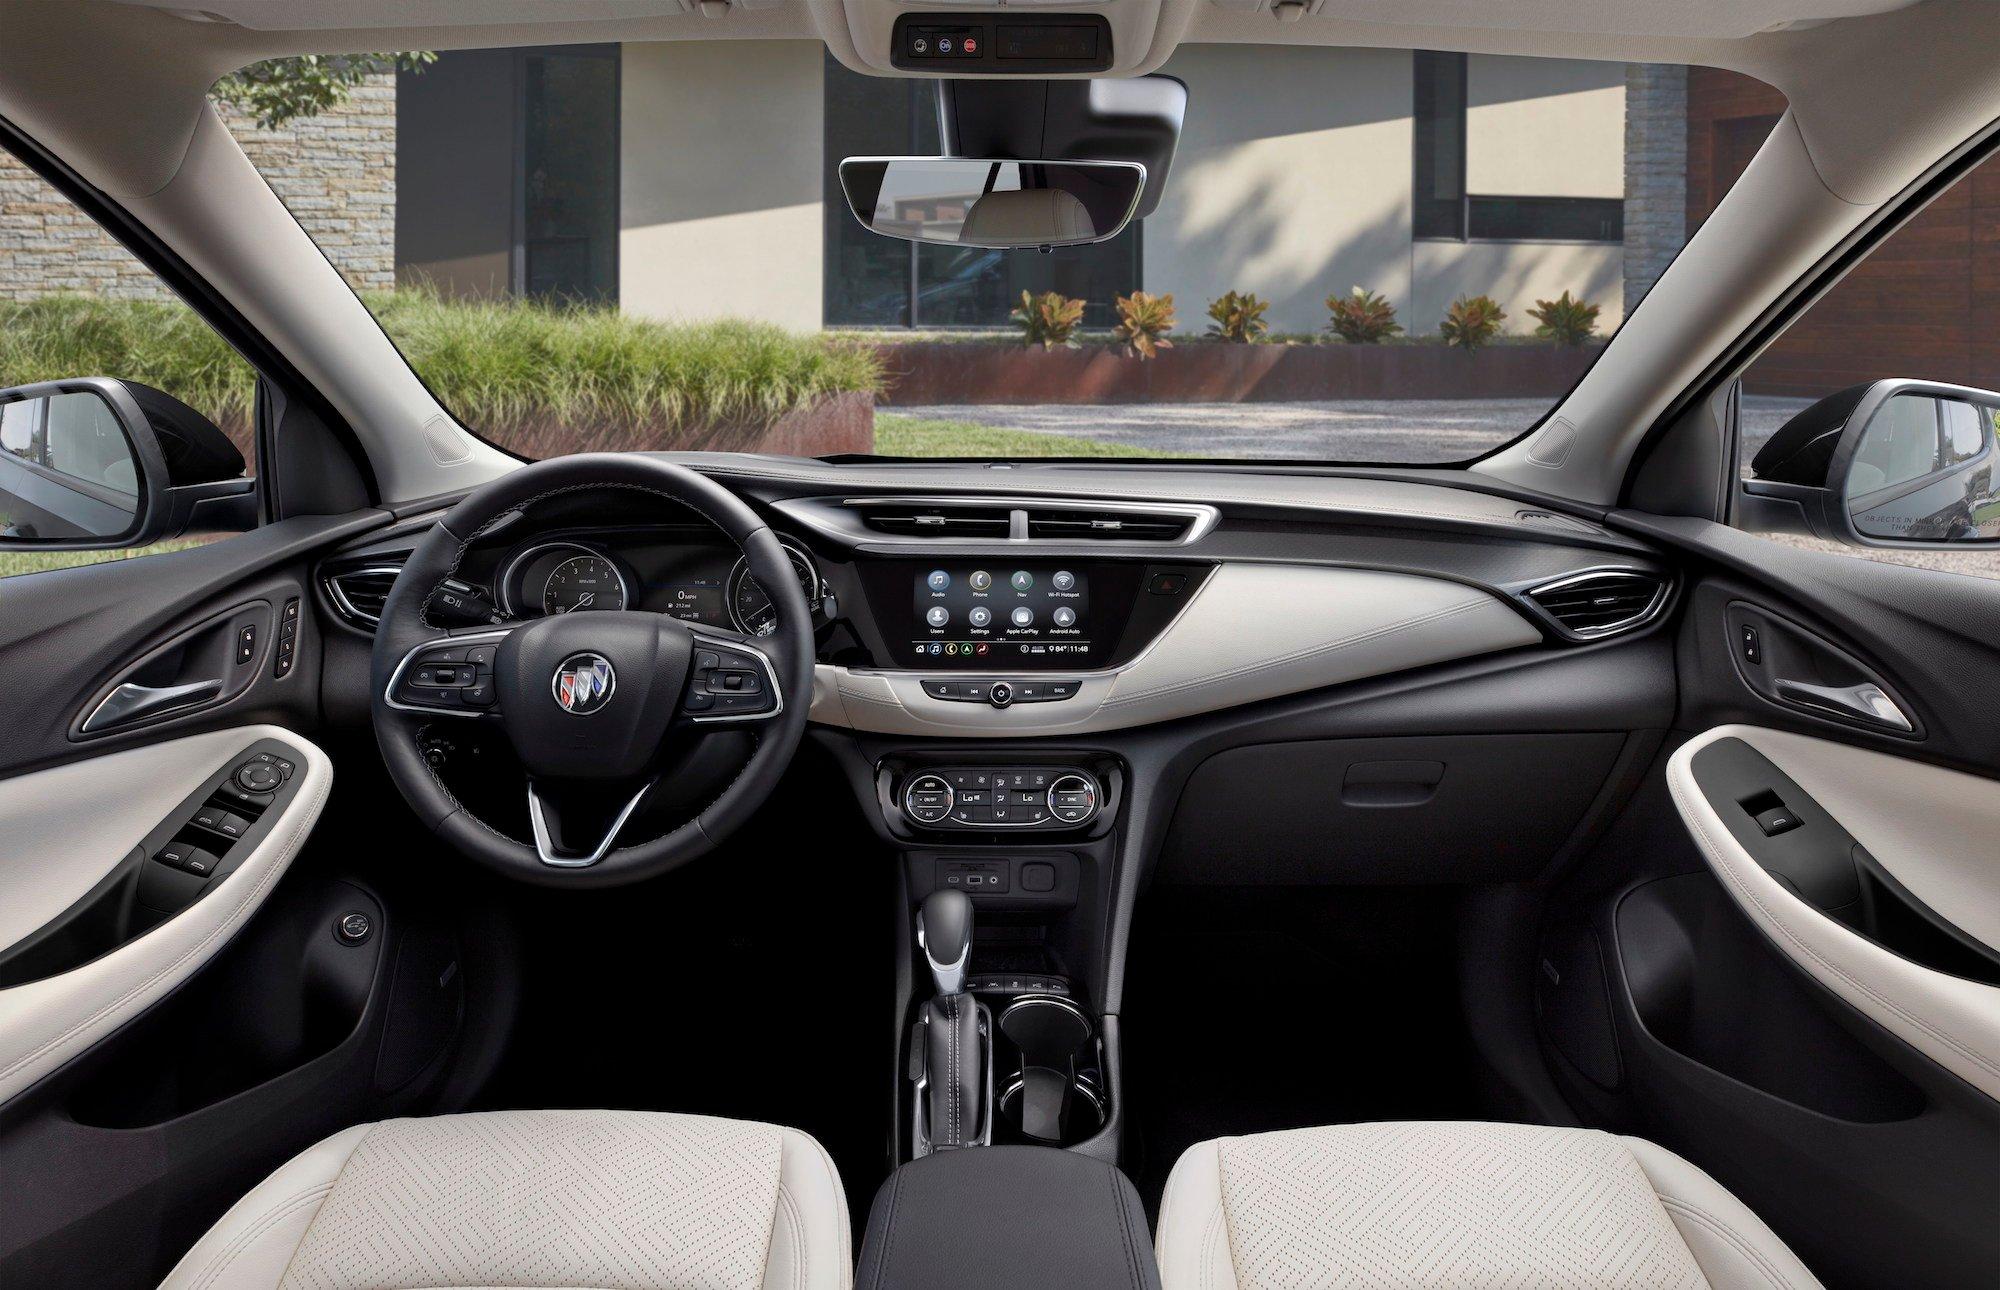 021-Buick-Encore-GX-cabin-credit-Buick.j